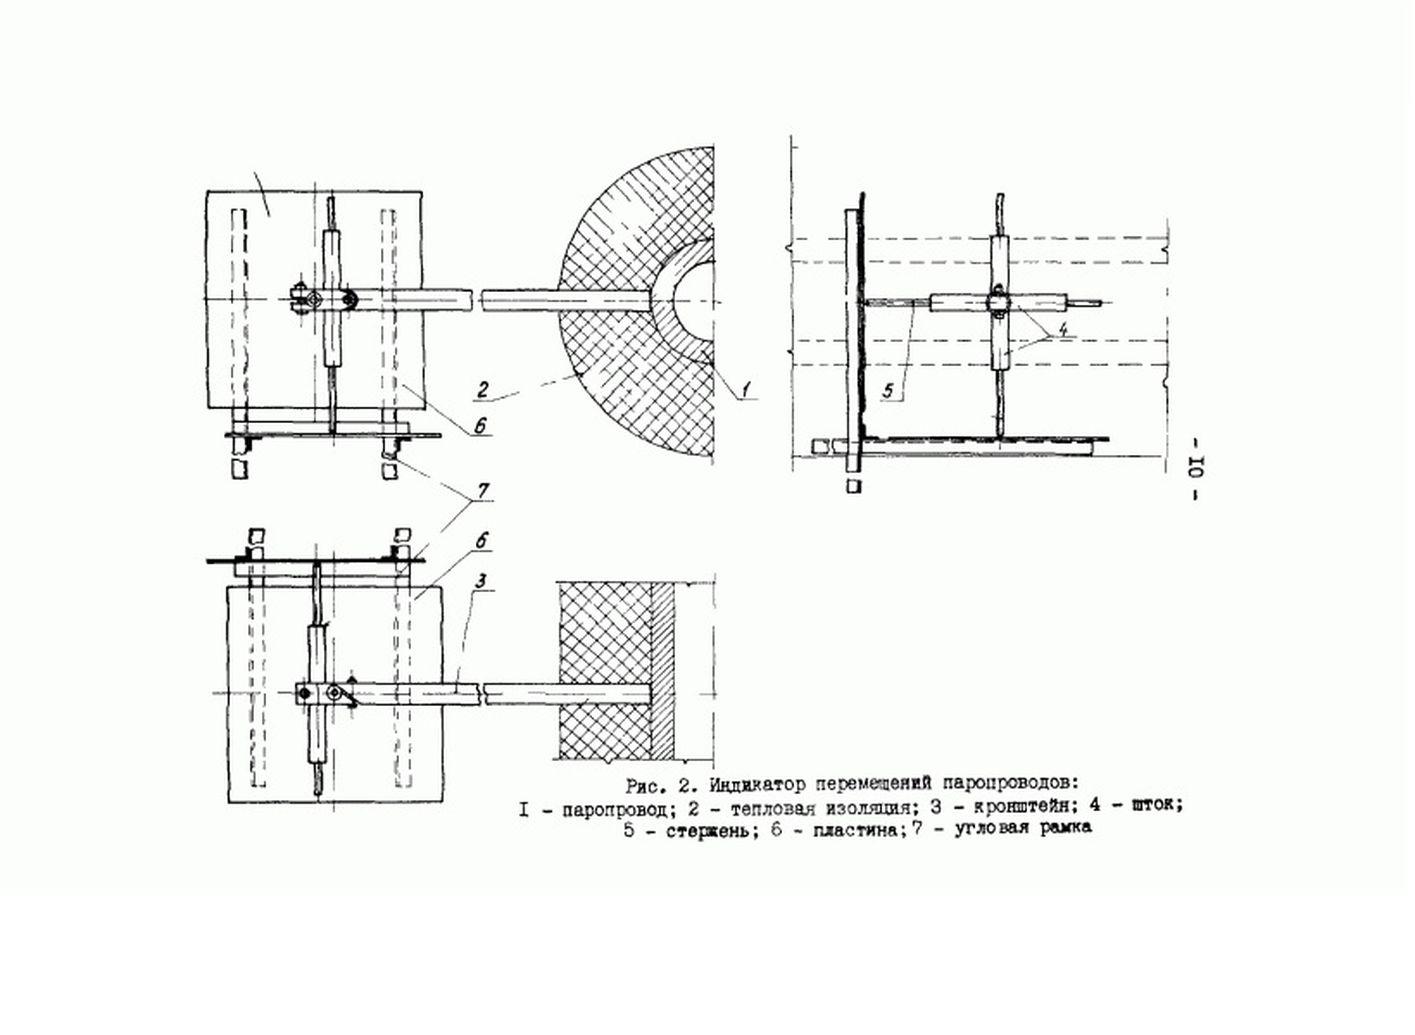 РД 34.39.301-87 стр.10